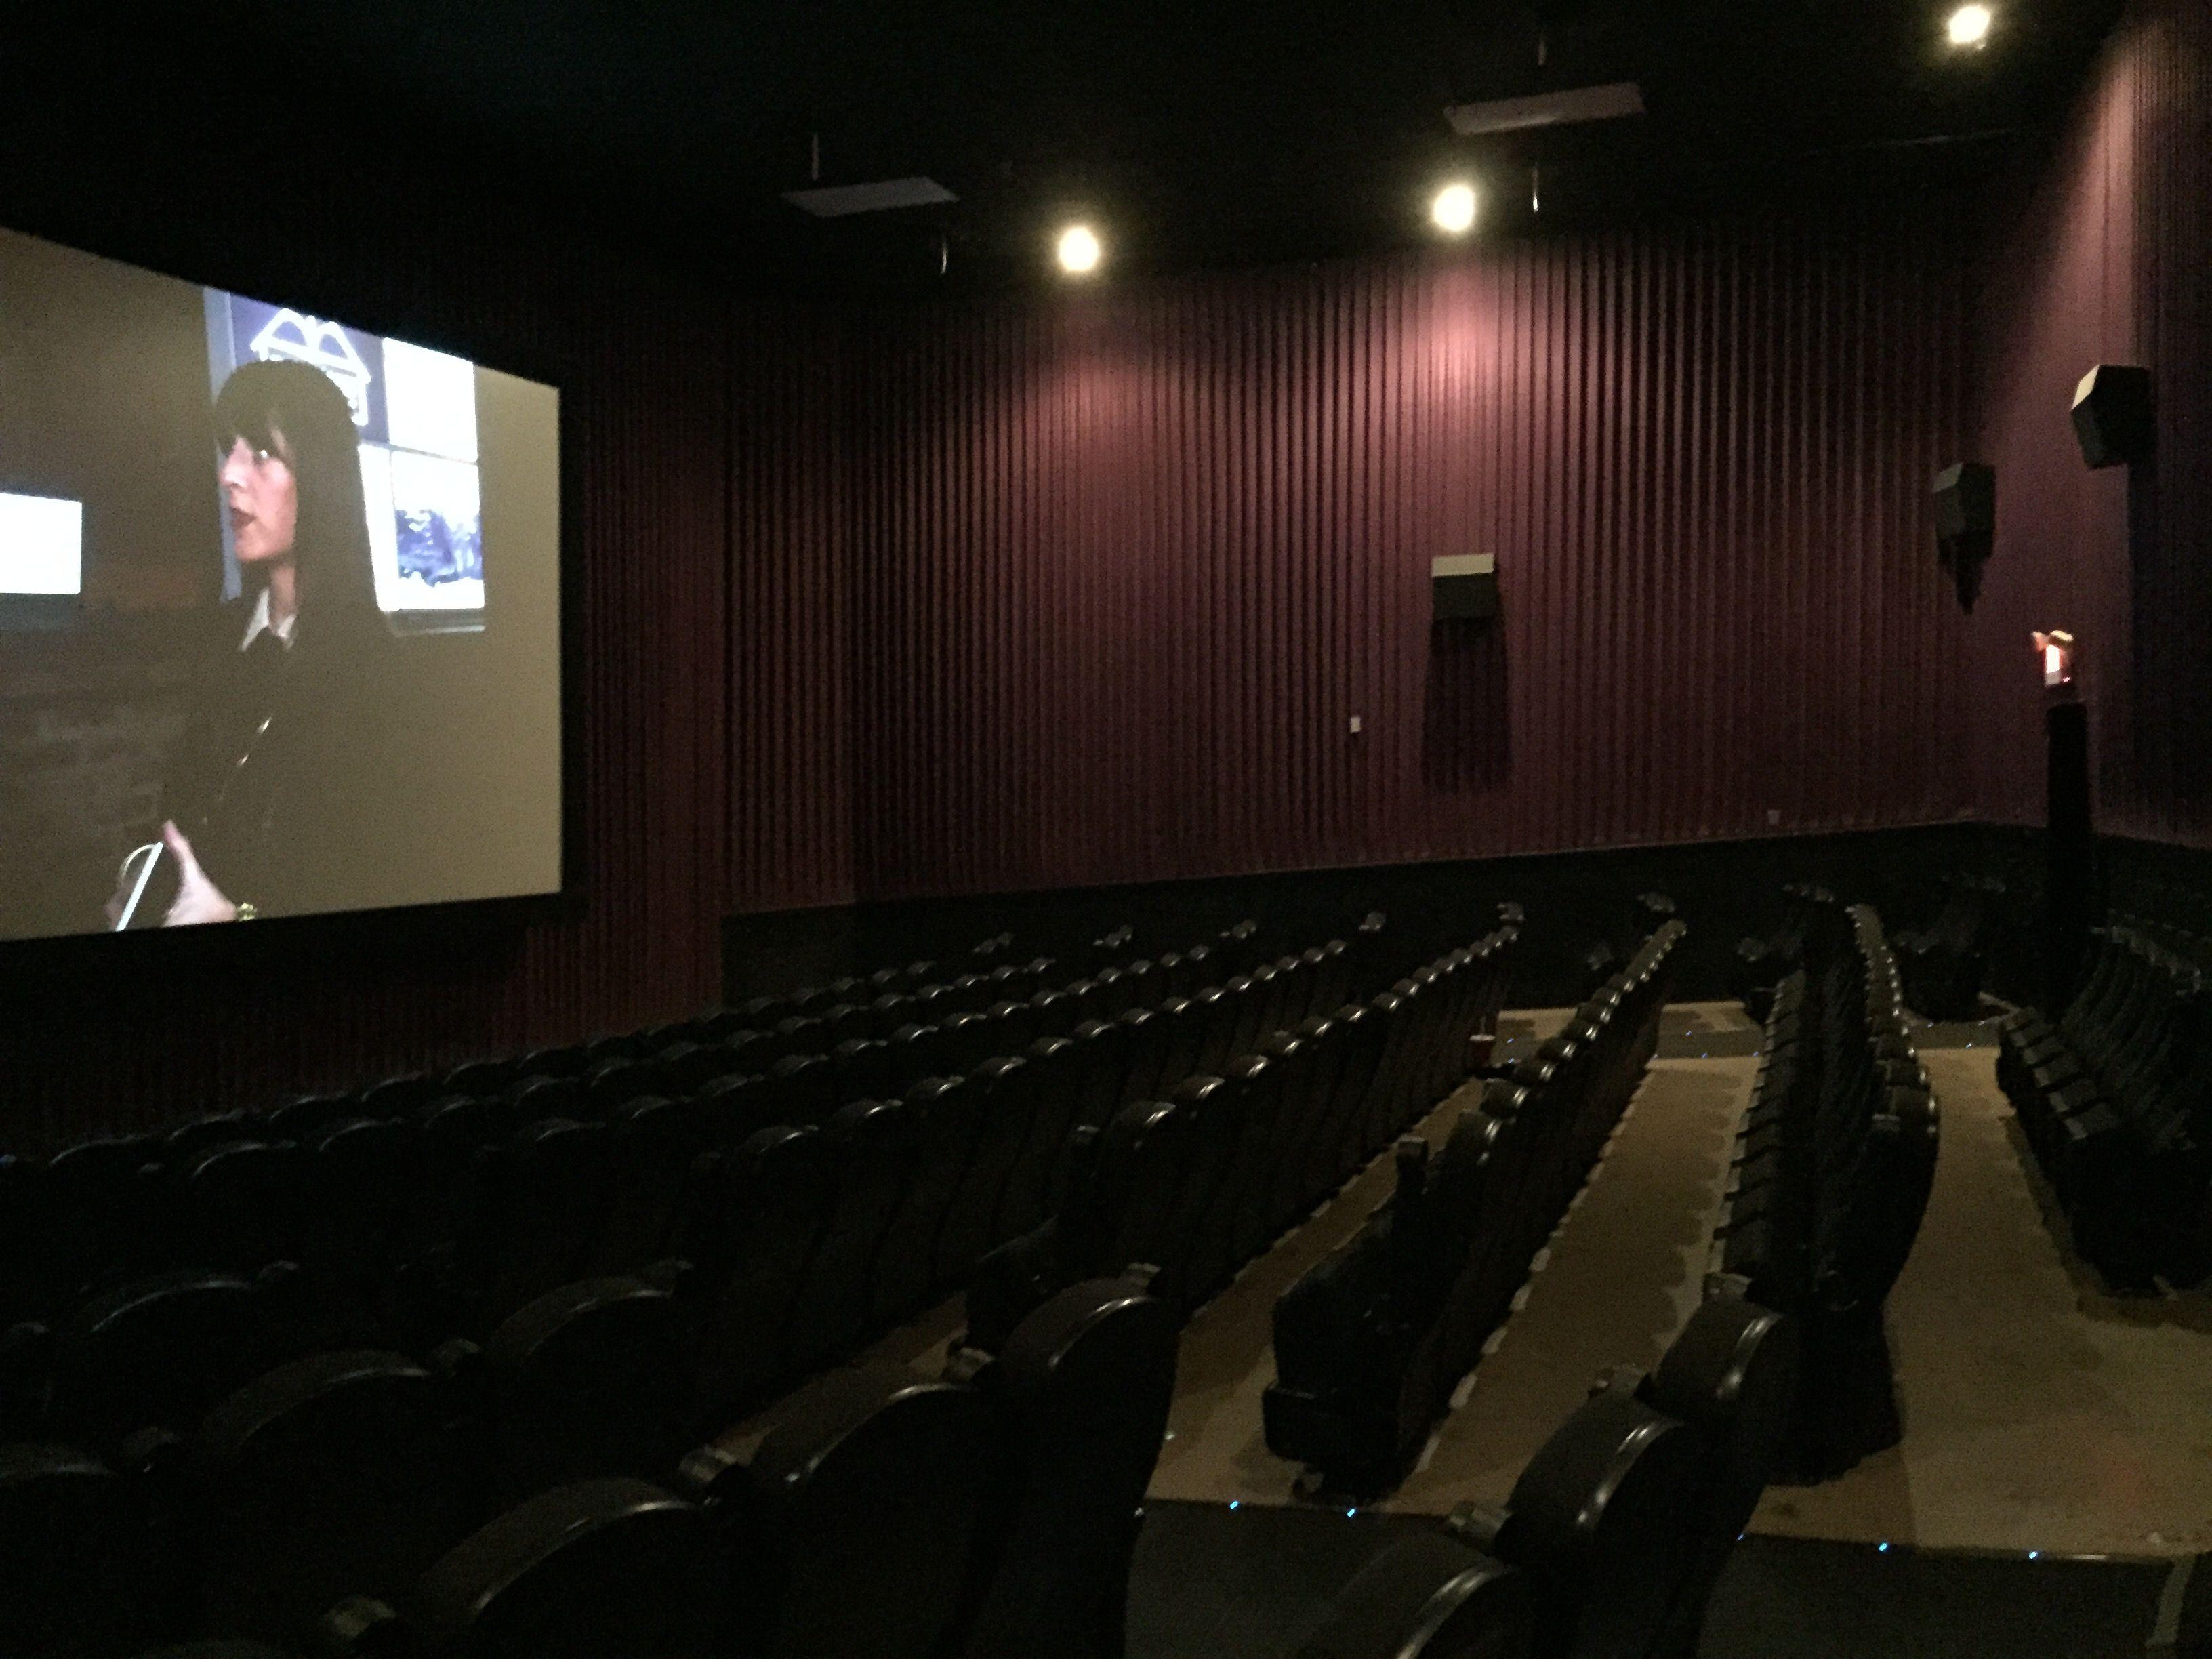 Empty seats at movie theater